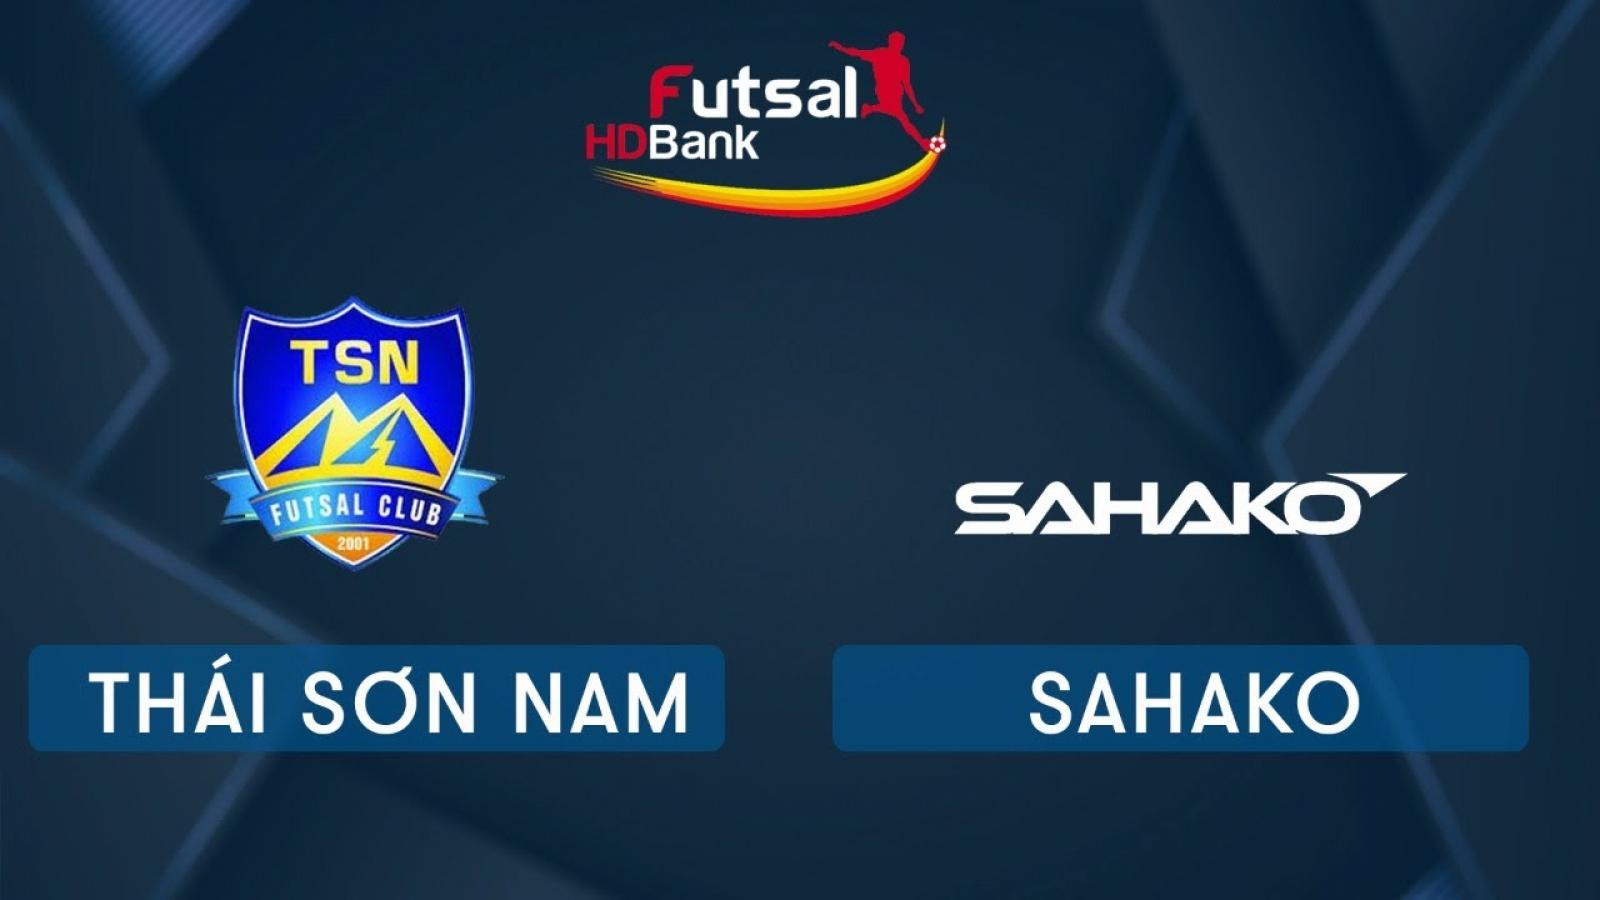 TRỰC TIẾP Thái Sơn Nam vs Sahako Giải Futsal HDBank 2020